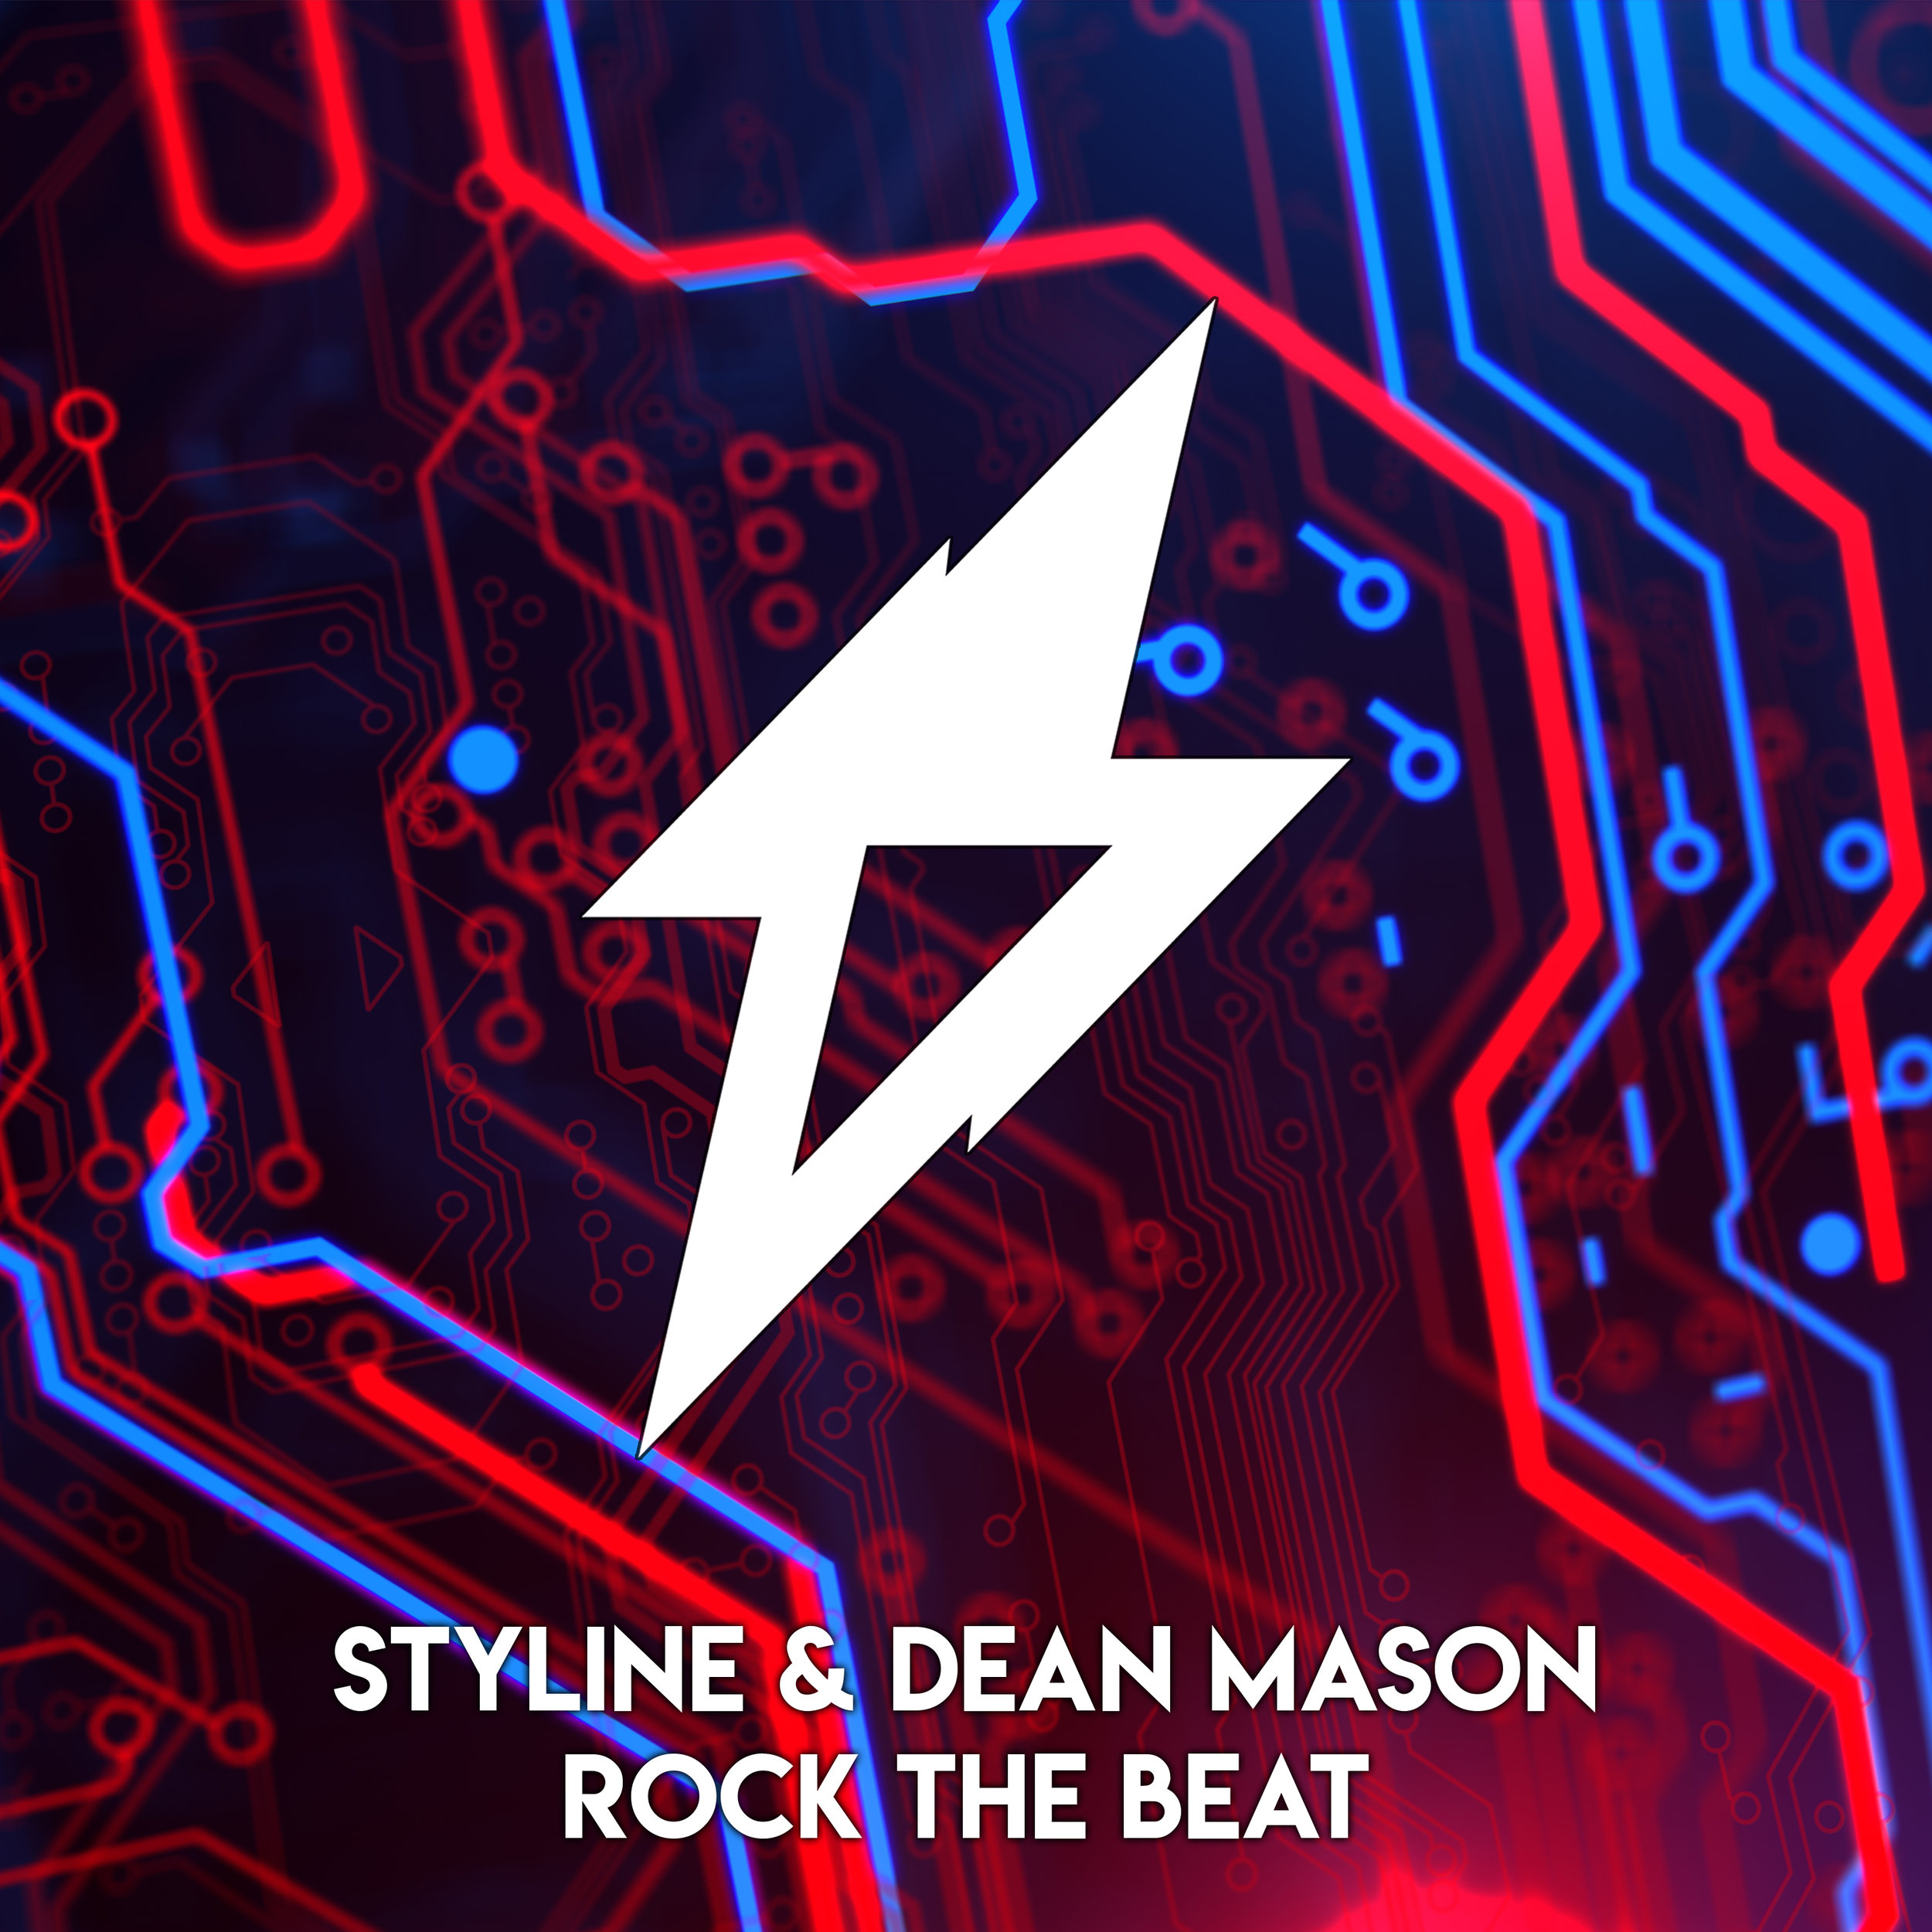 Styline & Dean Mason - Rock The Beat.jpg